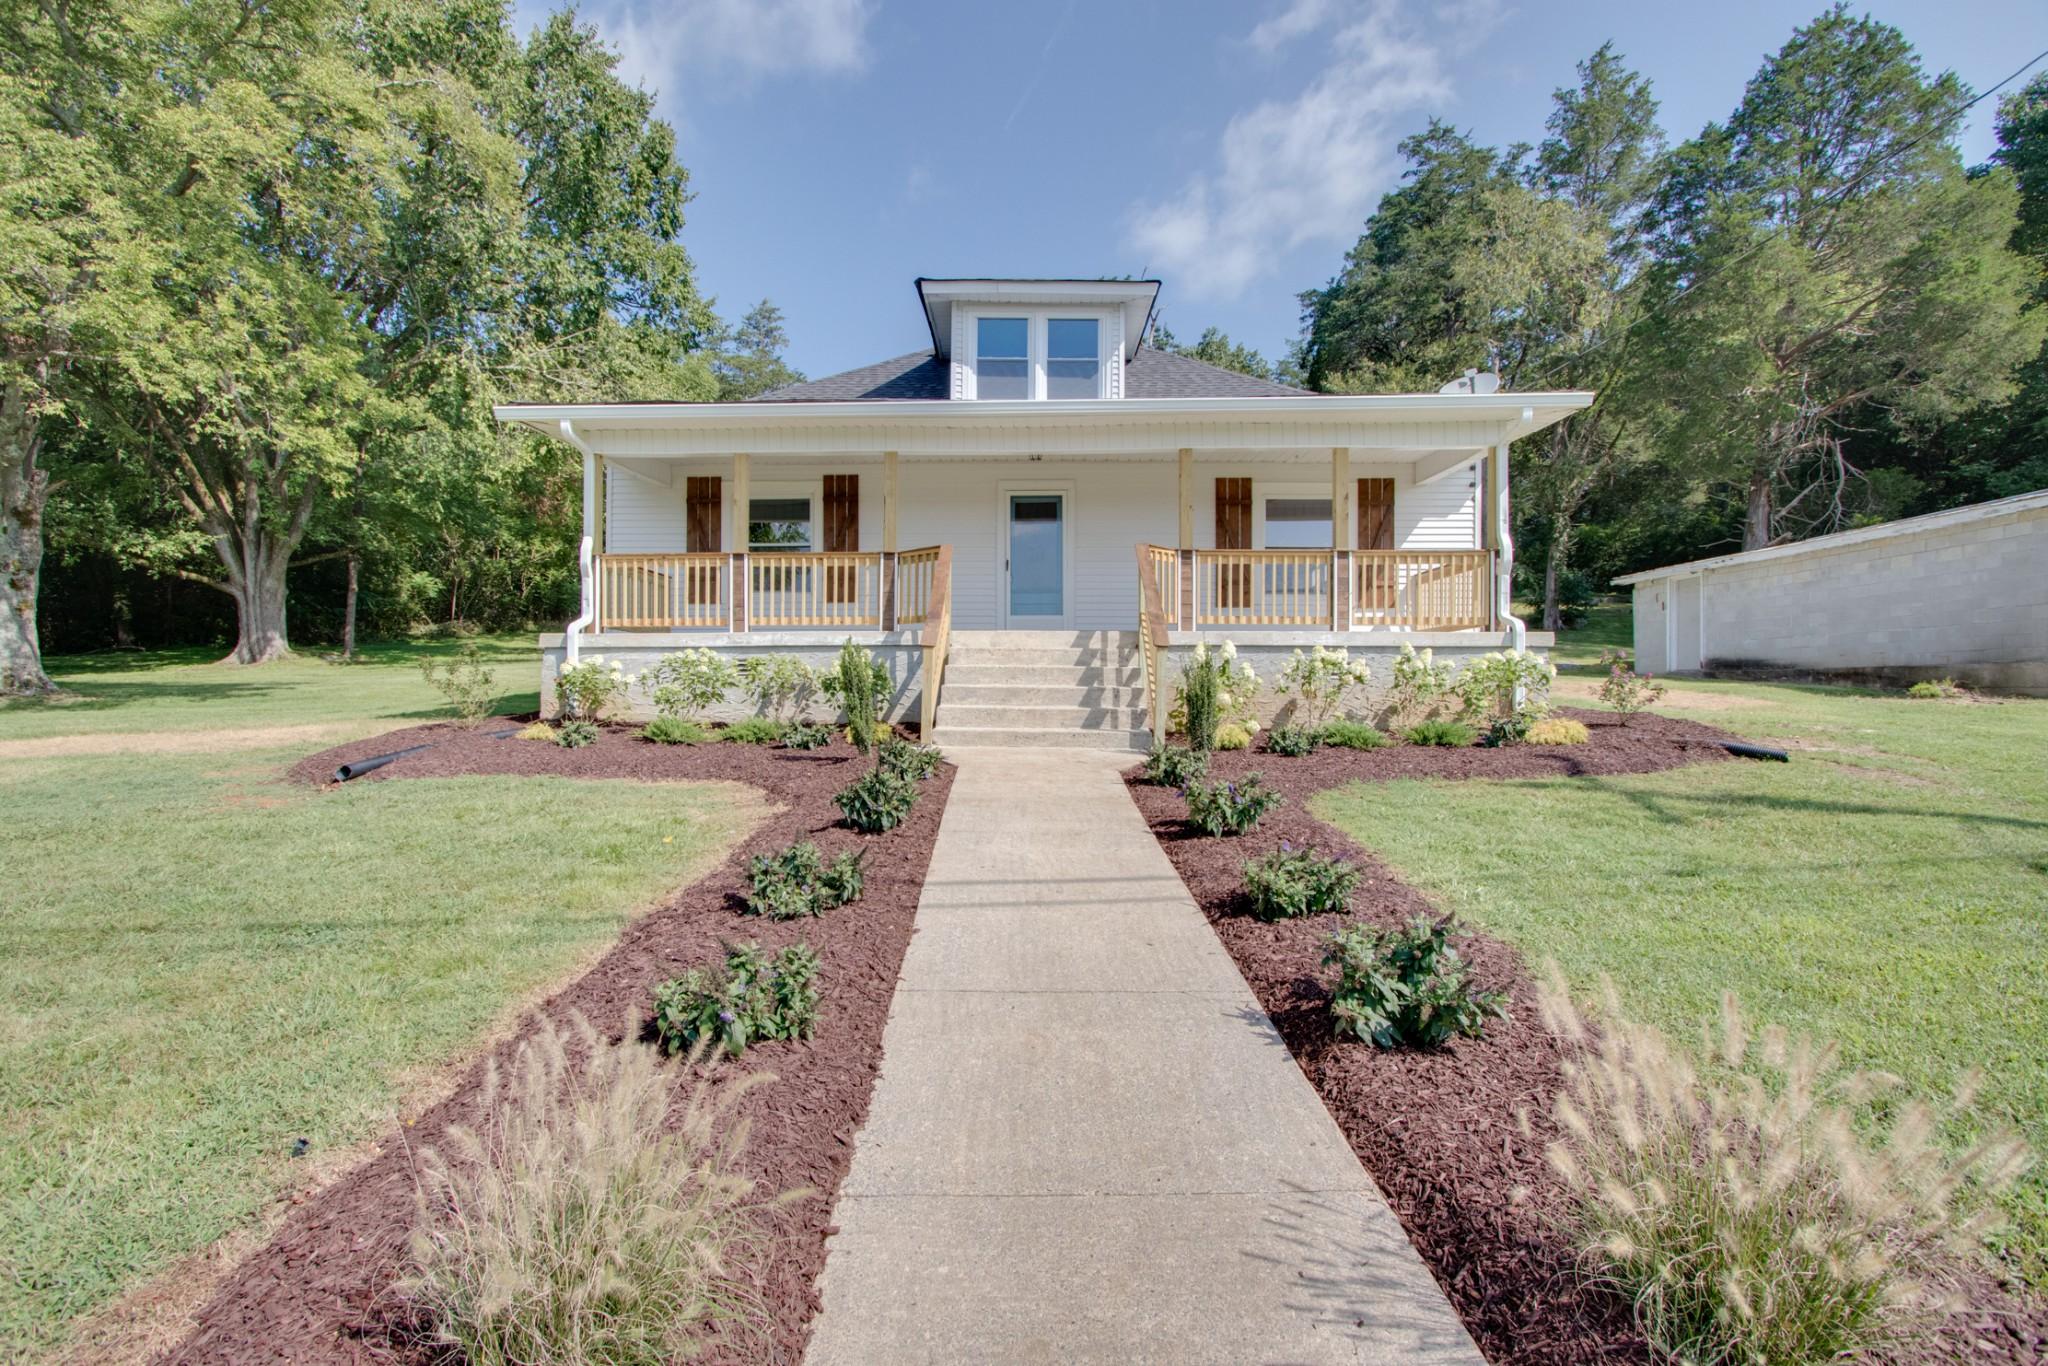 17 Brush Creek Rd, Brush Creek, TN 38547 - Brush Creek, TN real estate listing